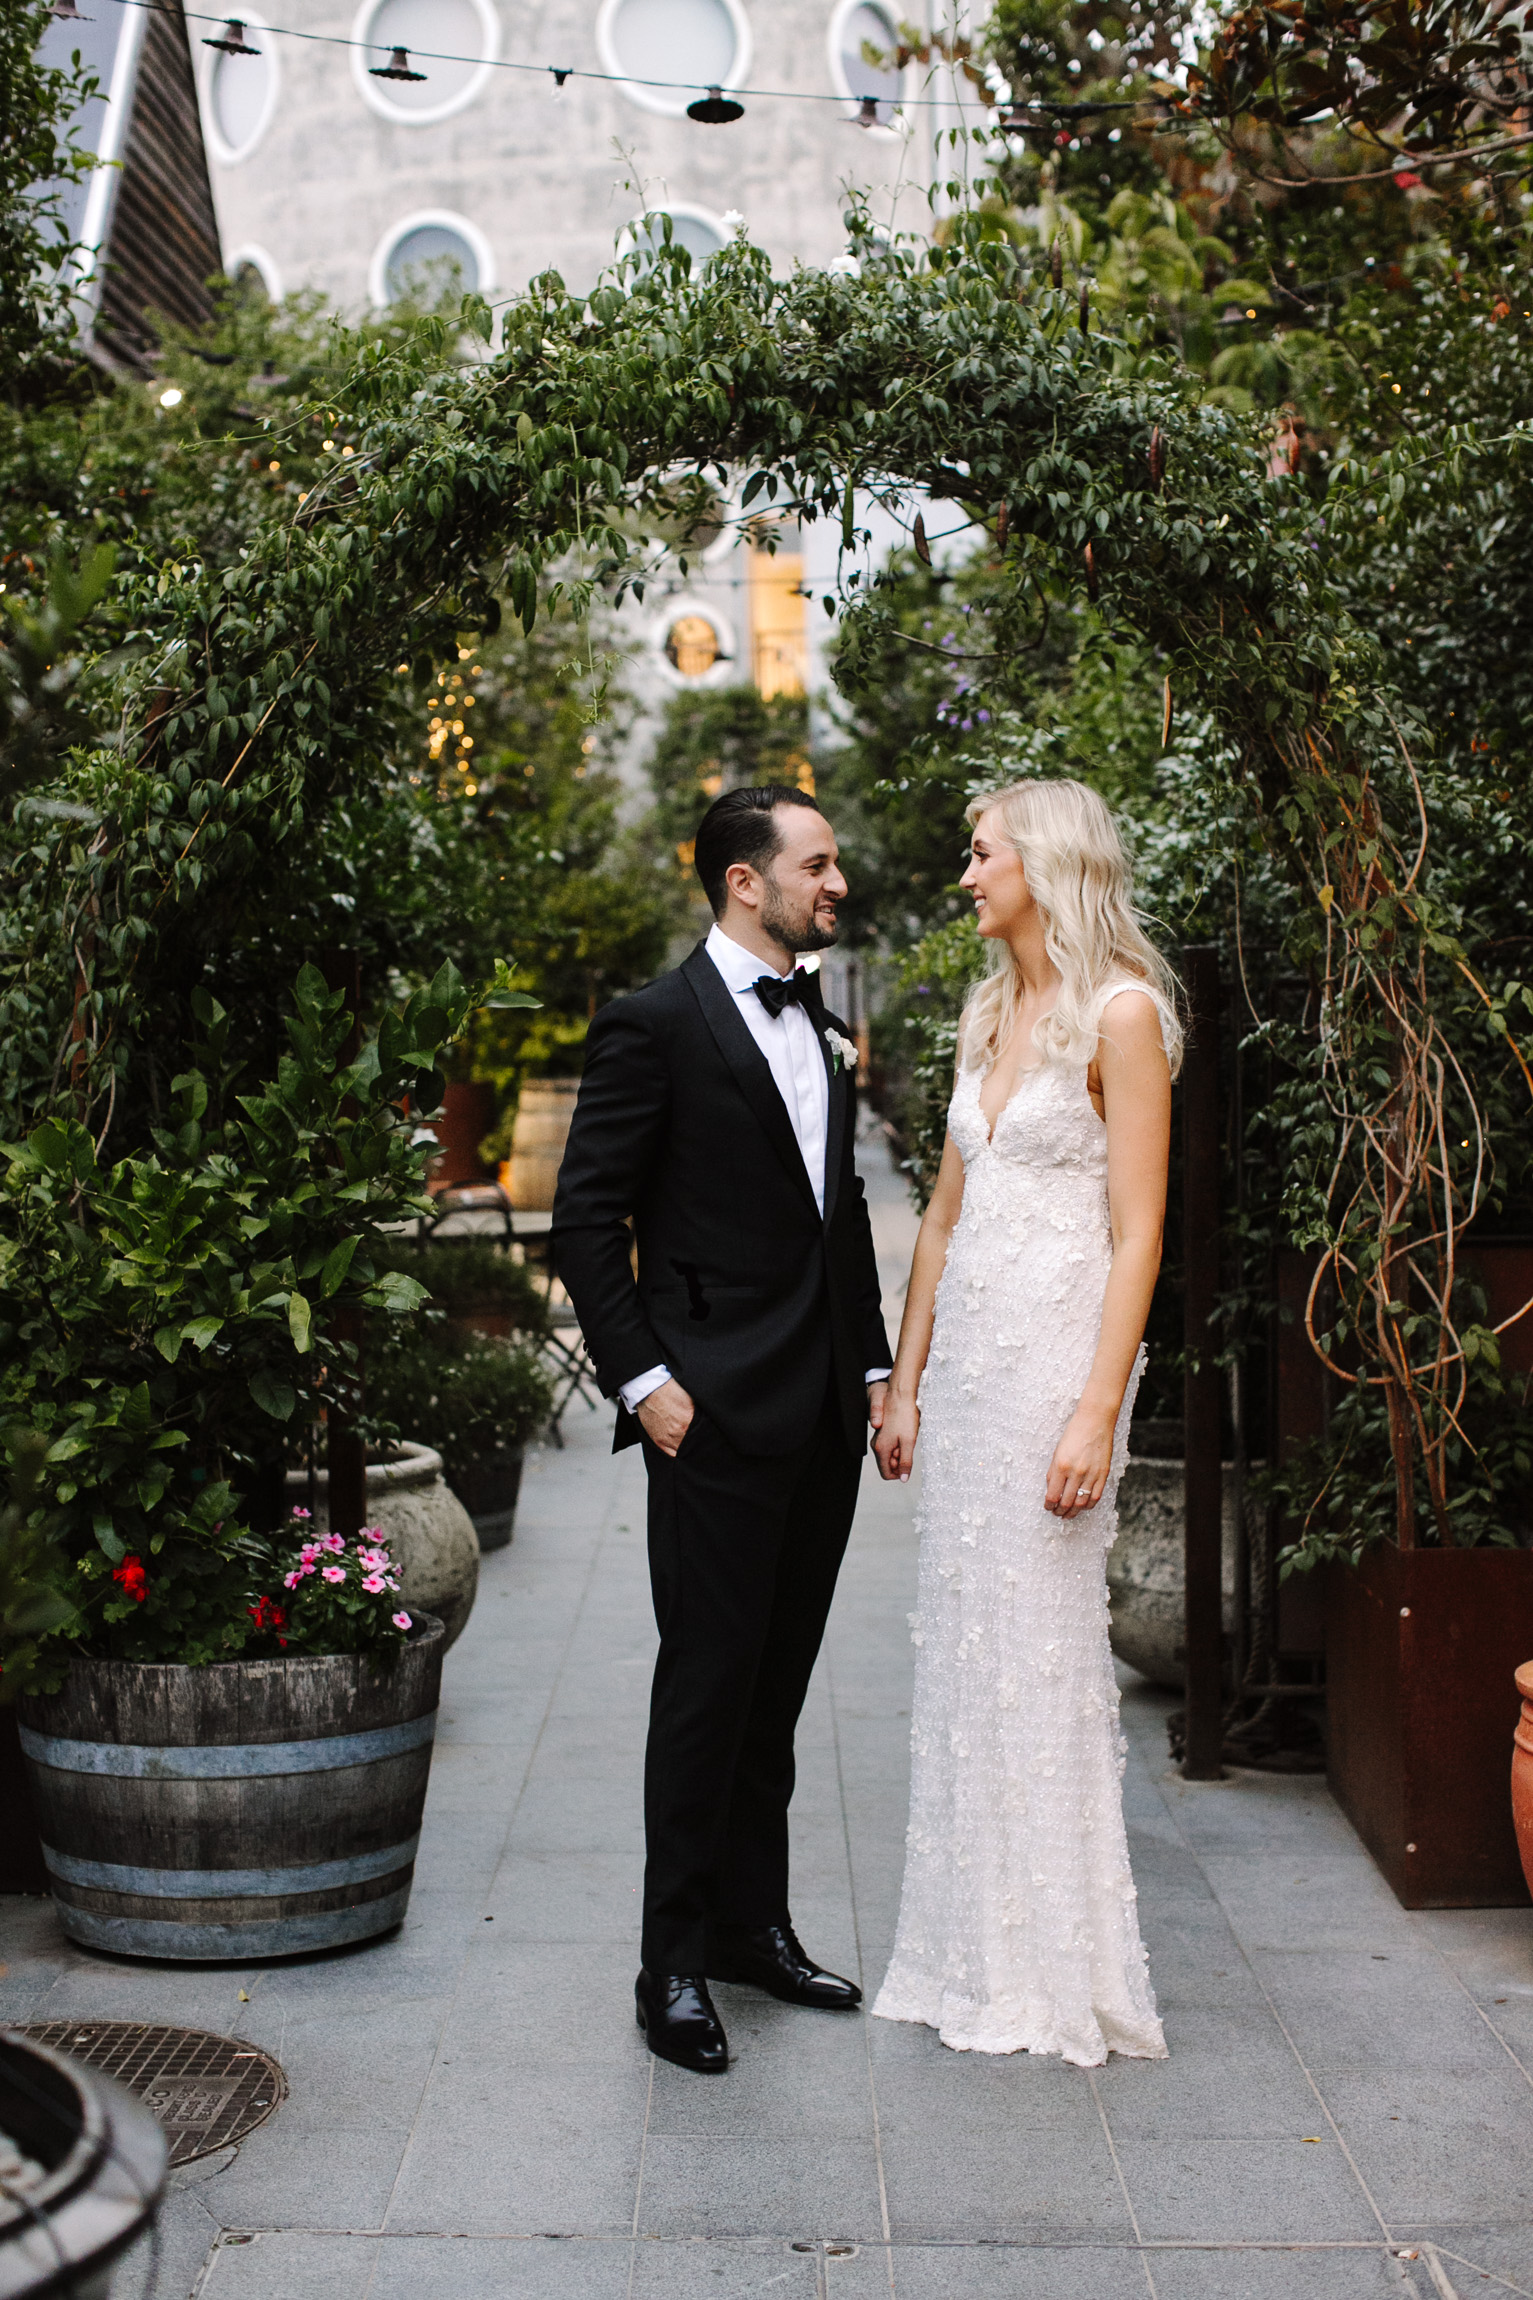 180223_justinaaron_wedding_charlotte_david_h-233.jpg